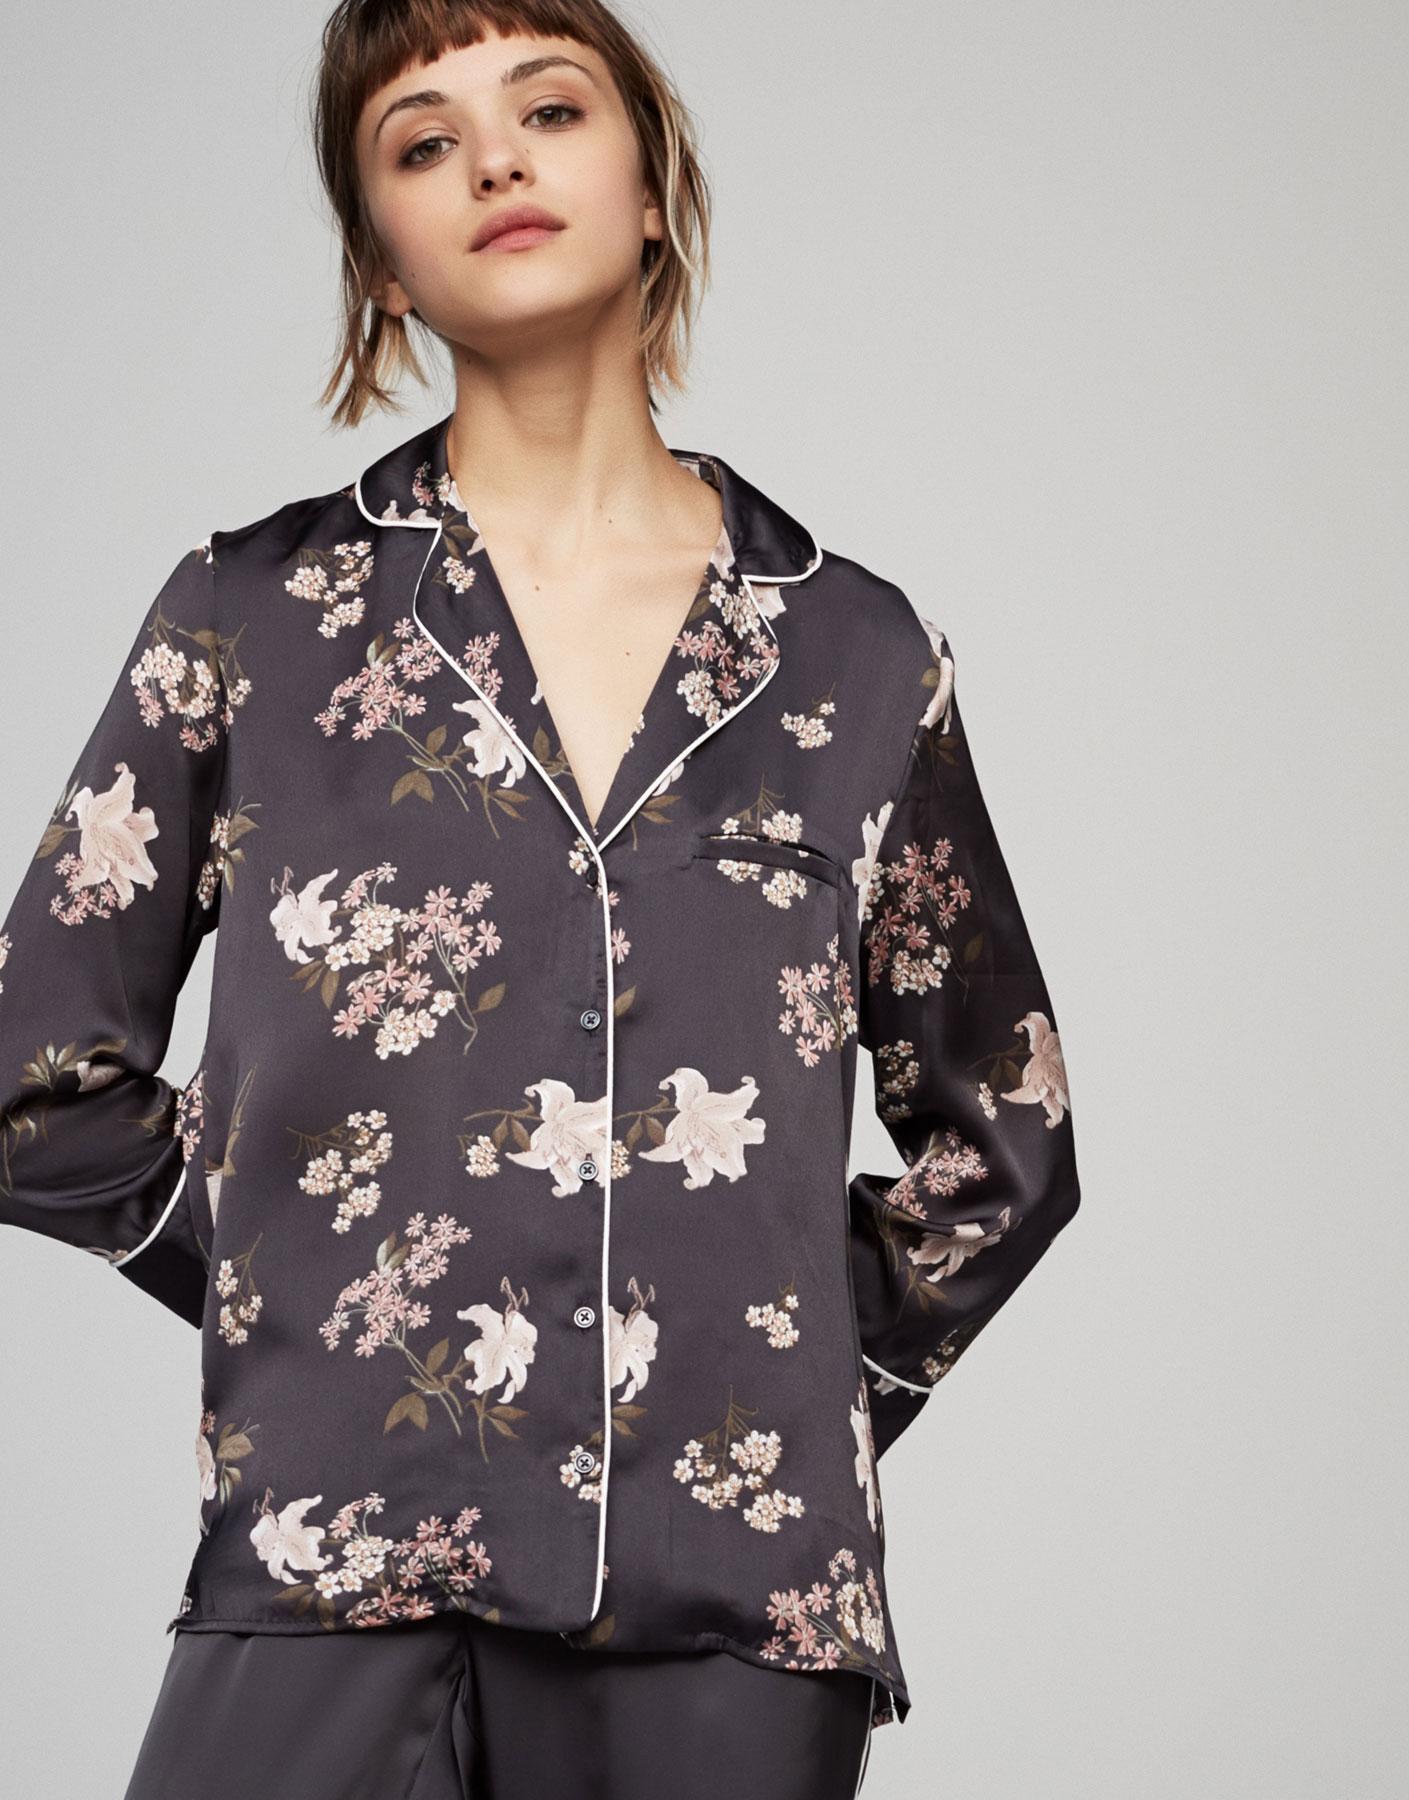 Camisa pijama estampado floes